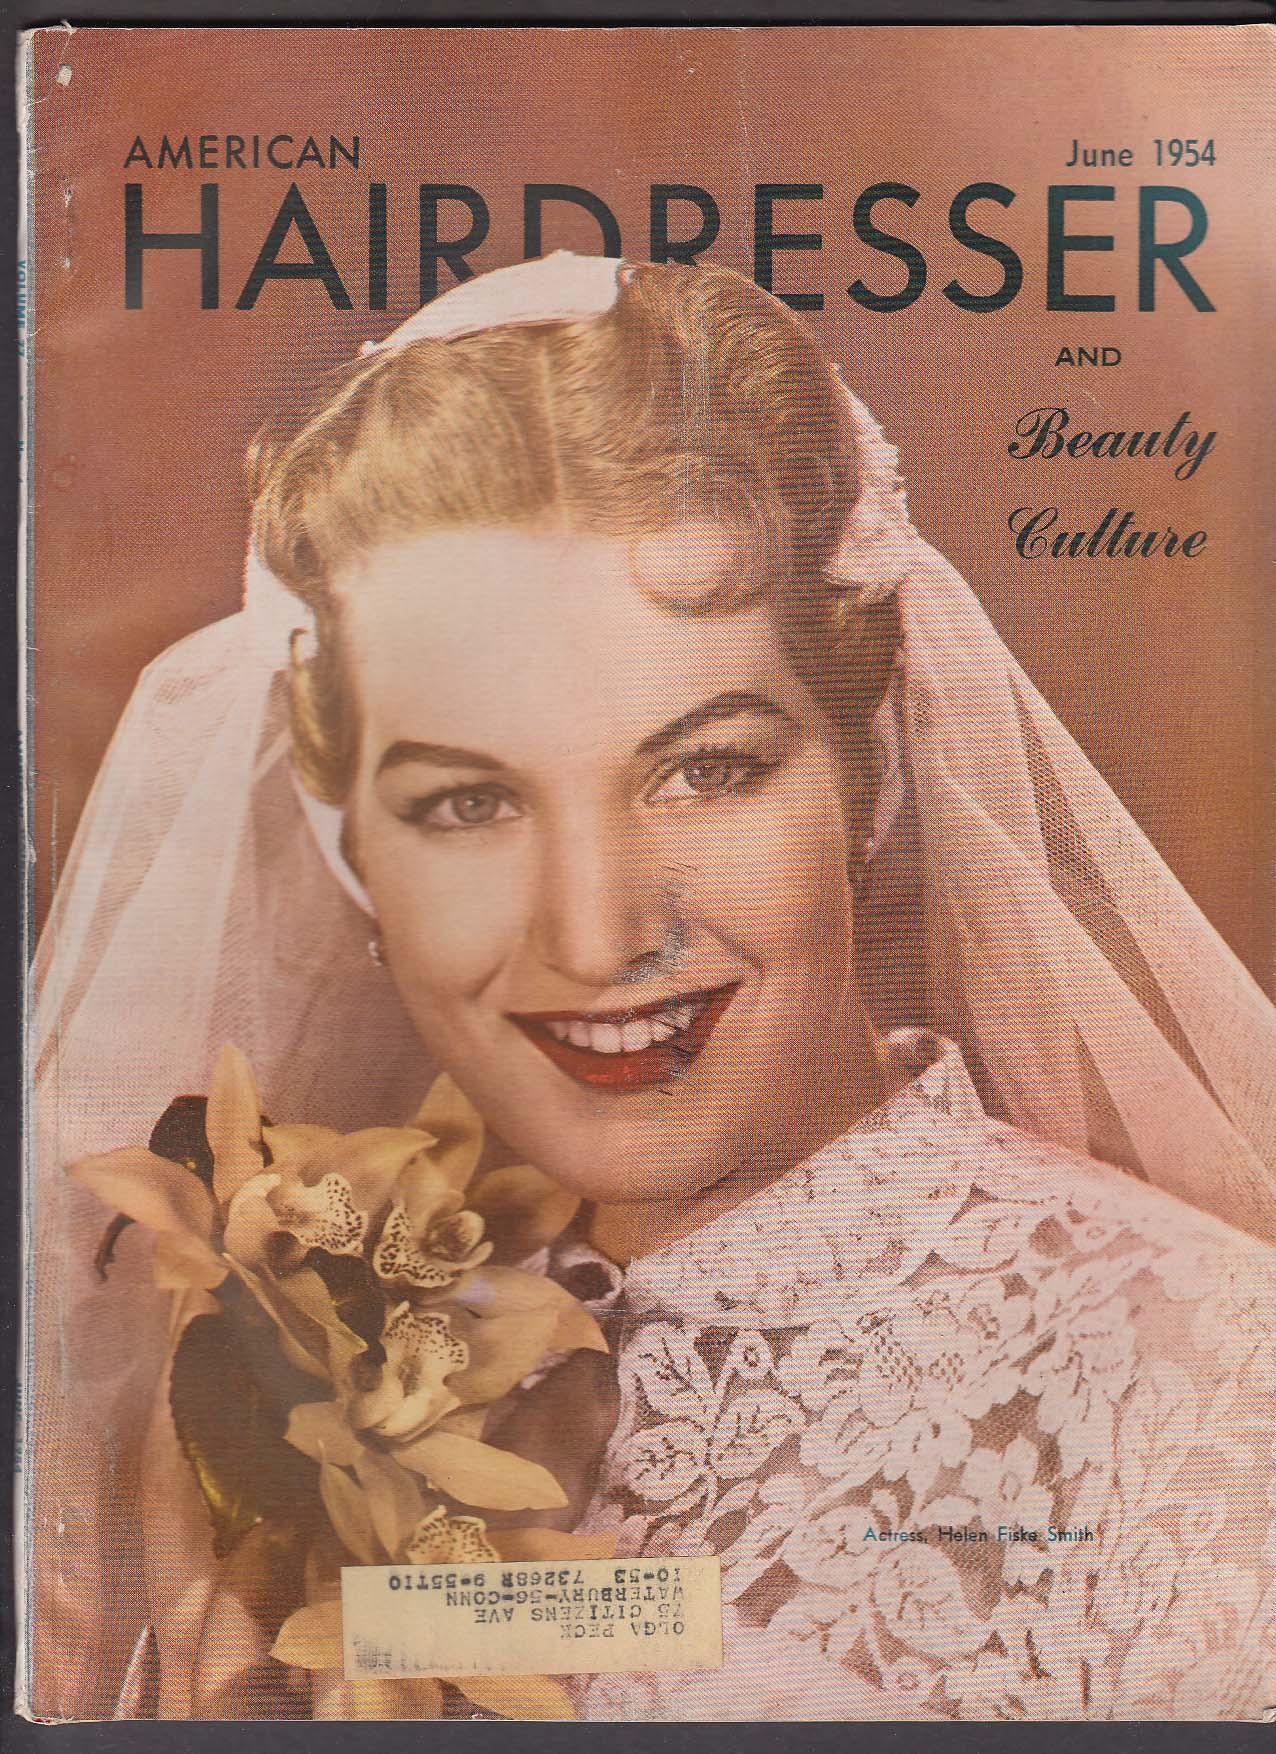 AMERICAN HAIRDRESSER Helen Fiske Smith Bridal Hairstyles ++ 6 1954